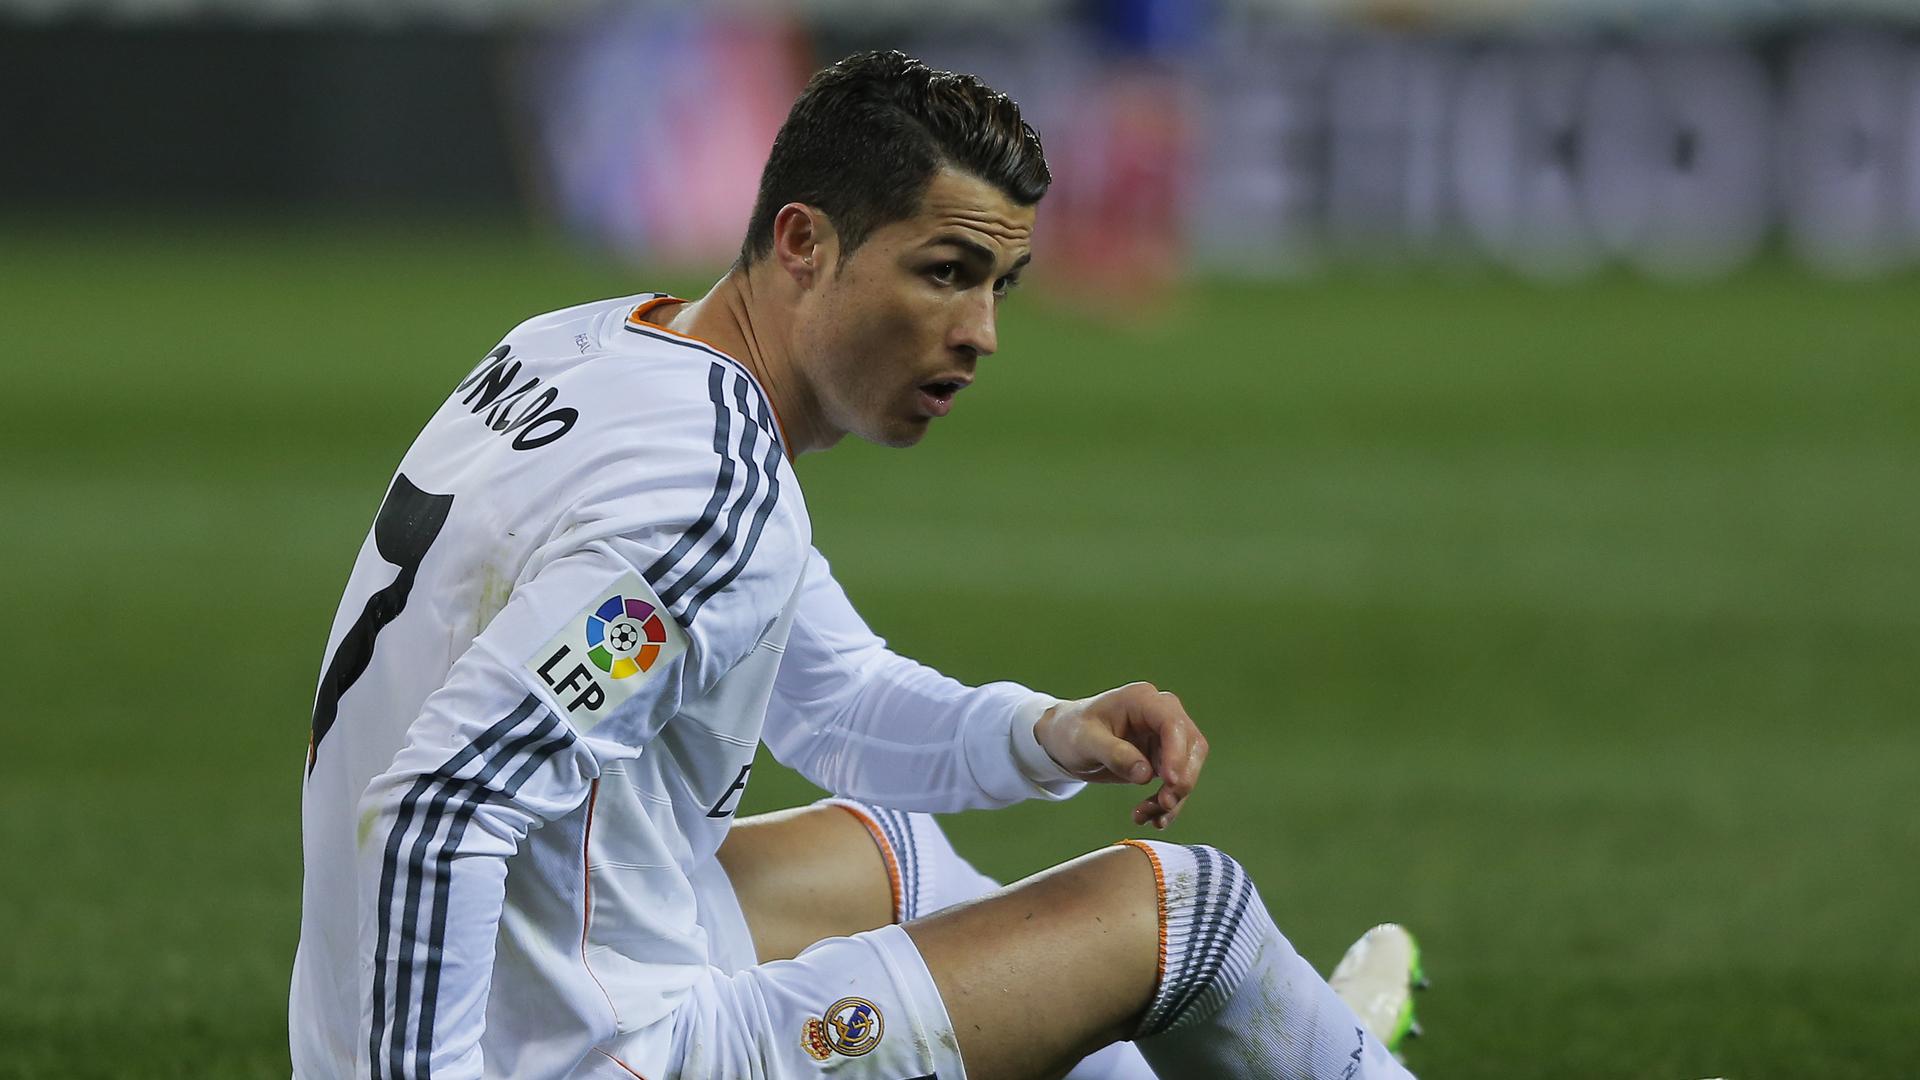 Cristiano-Ronaldo-FTR-021114.jpg